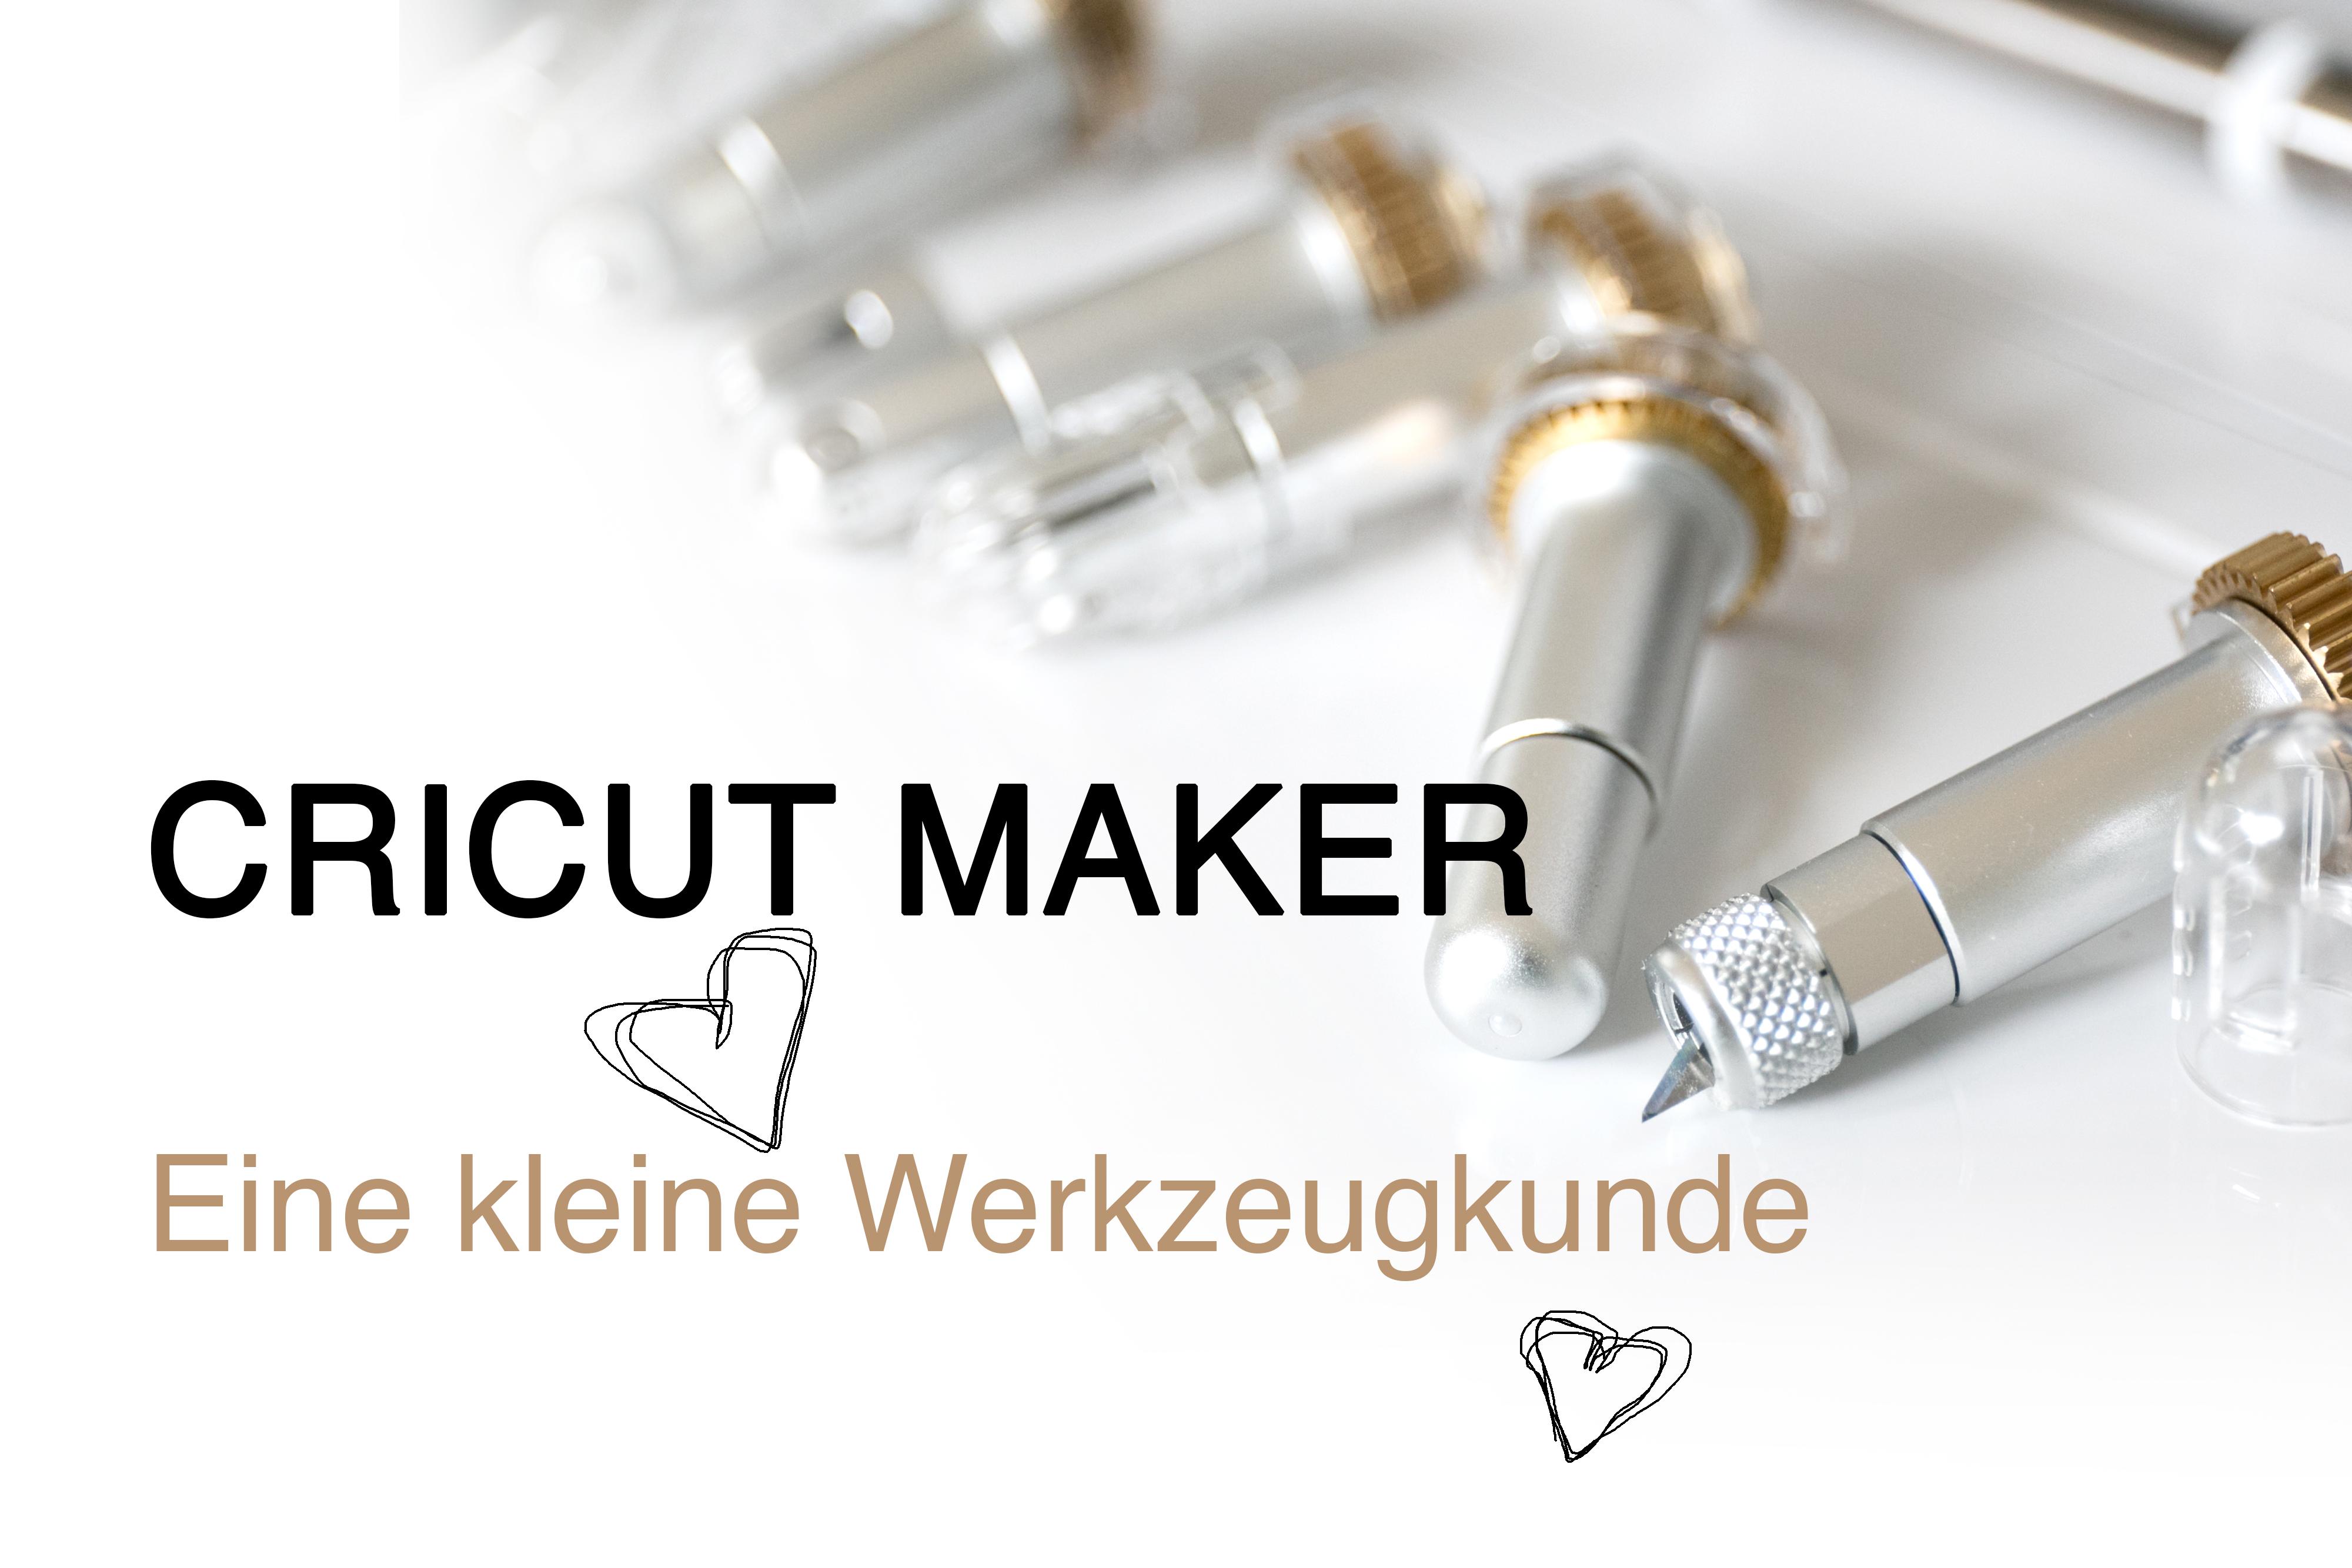 Cricut Maker Tools deutsch